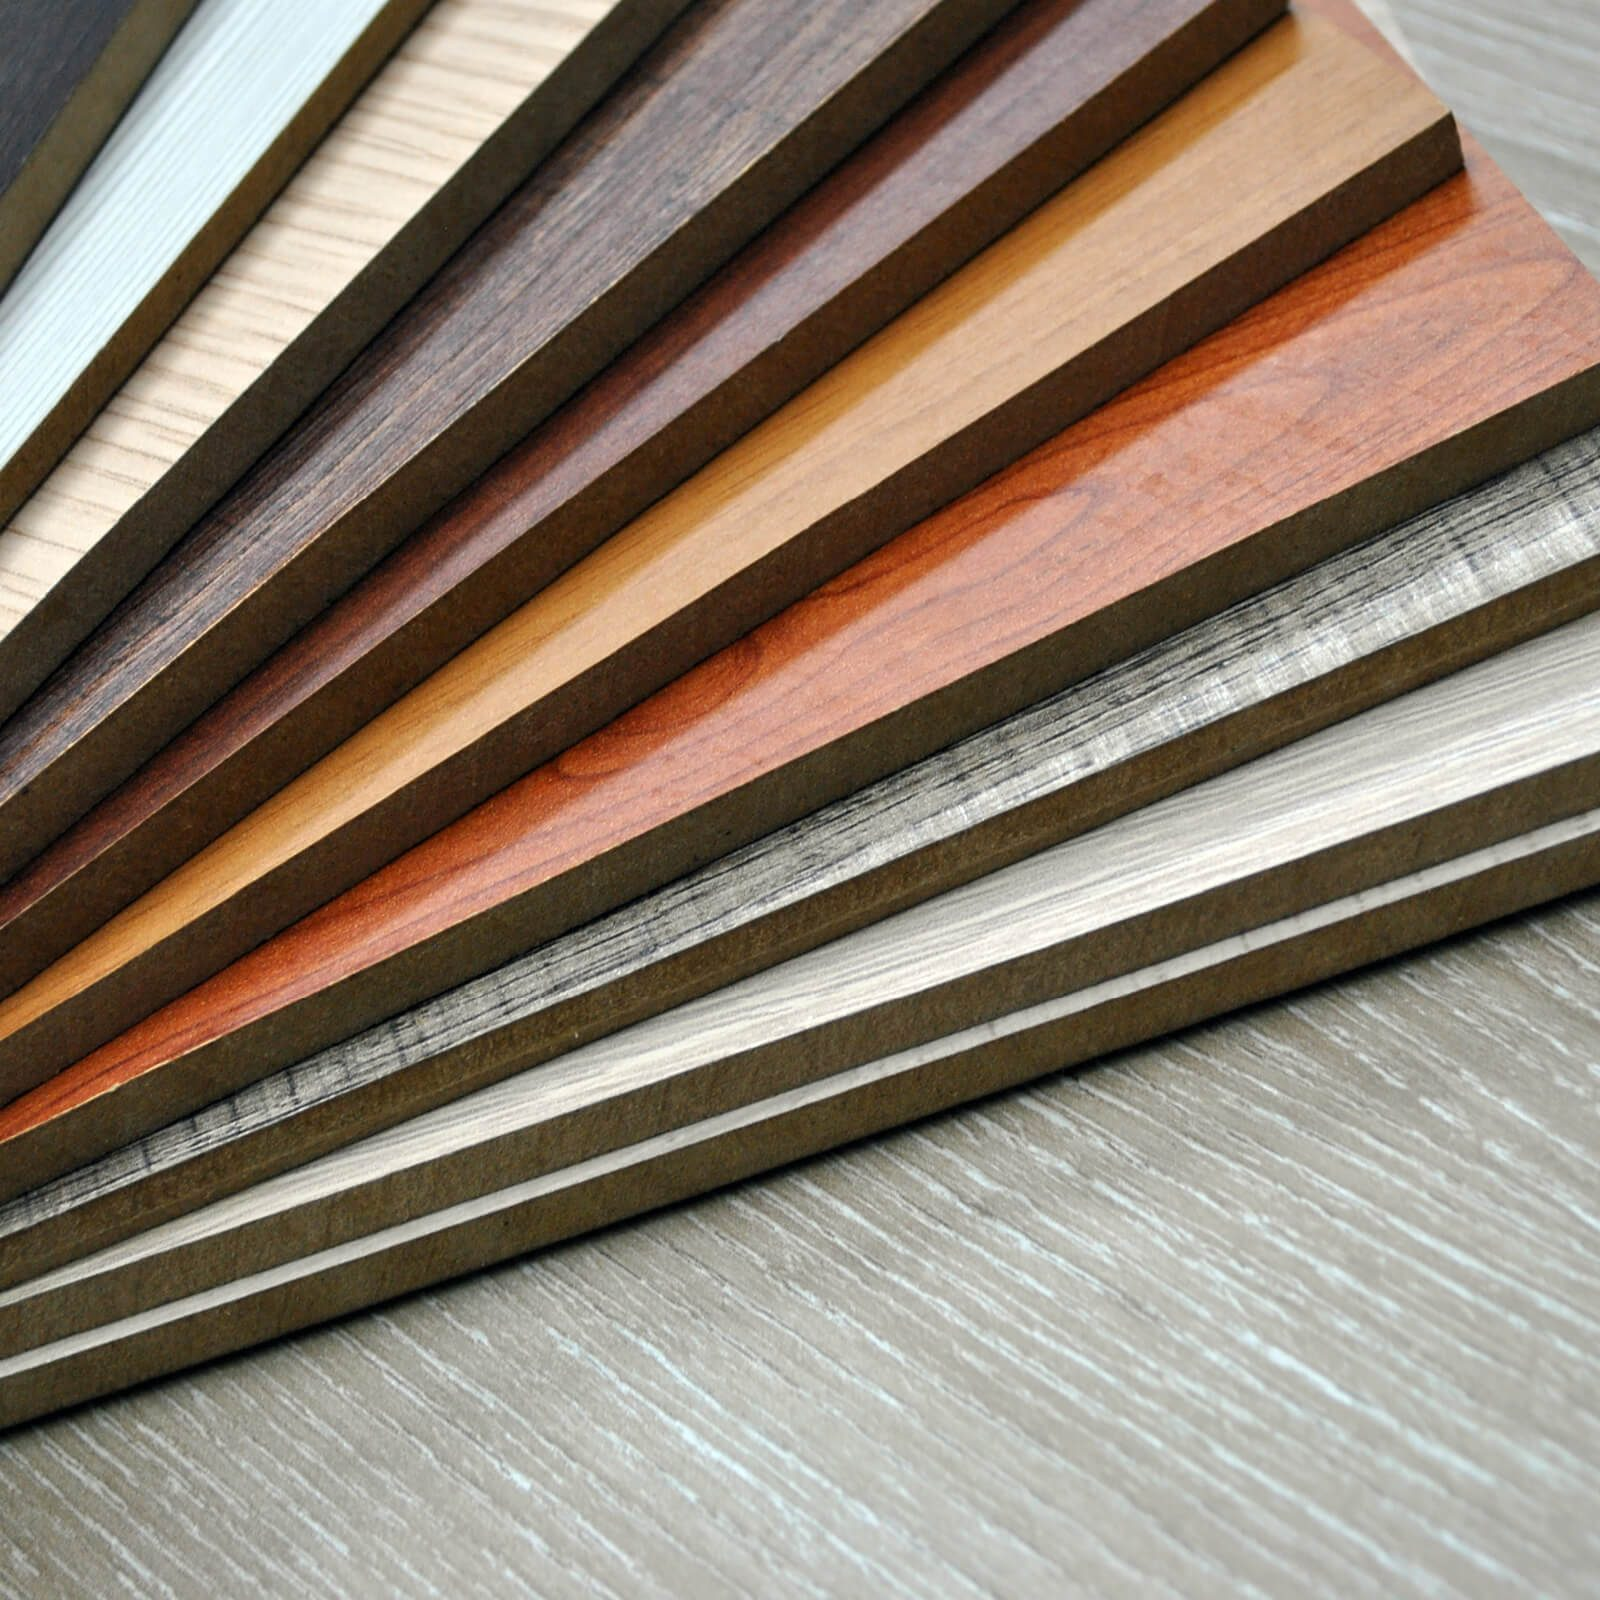 Laminate faqs | McCool's Flooring